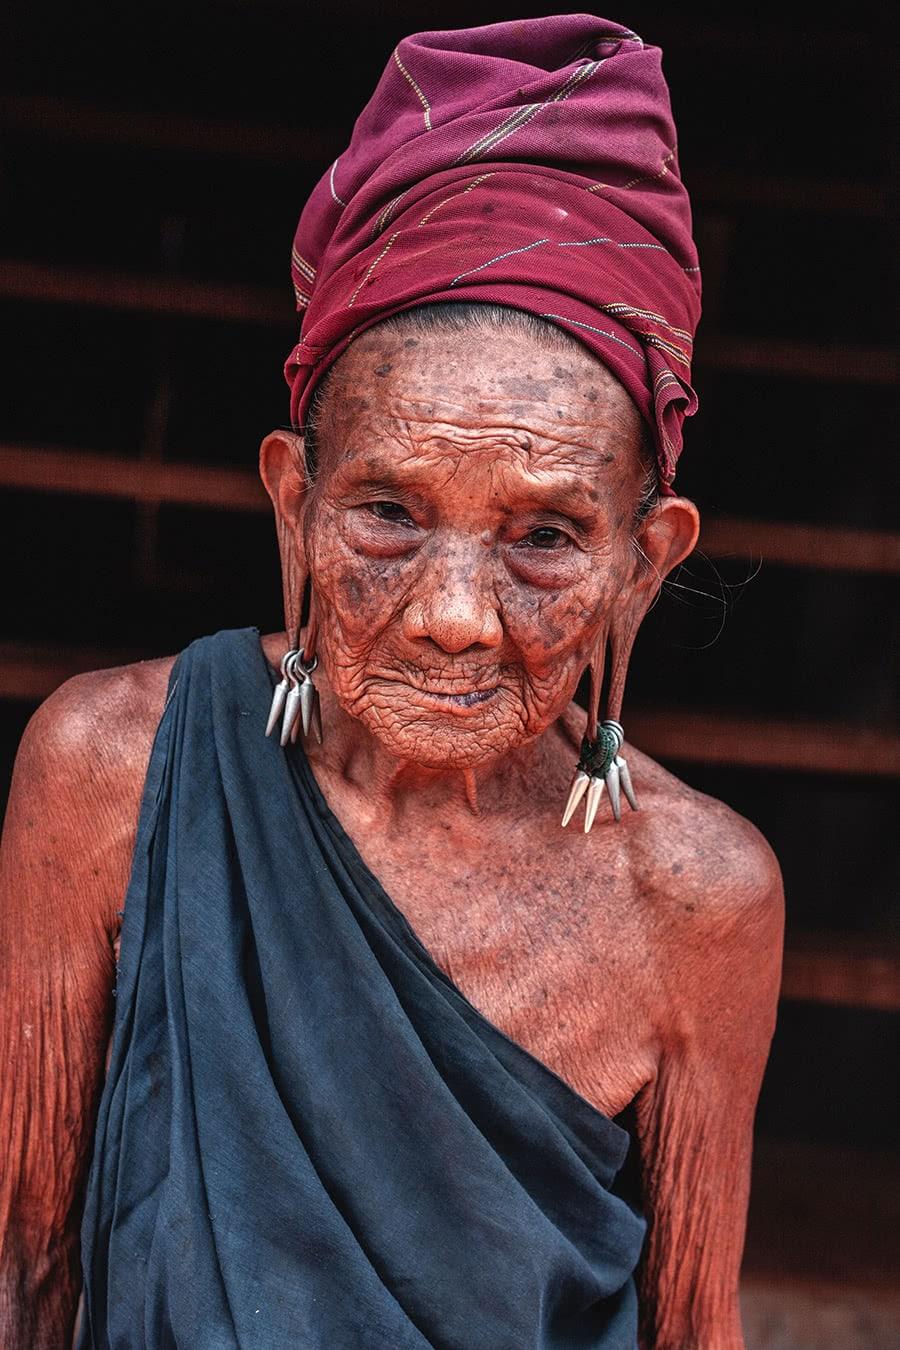 A woman from the Kayah tribe, at Dawsaw Pyar village, Myanmar.